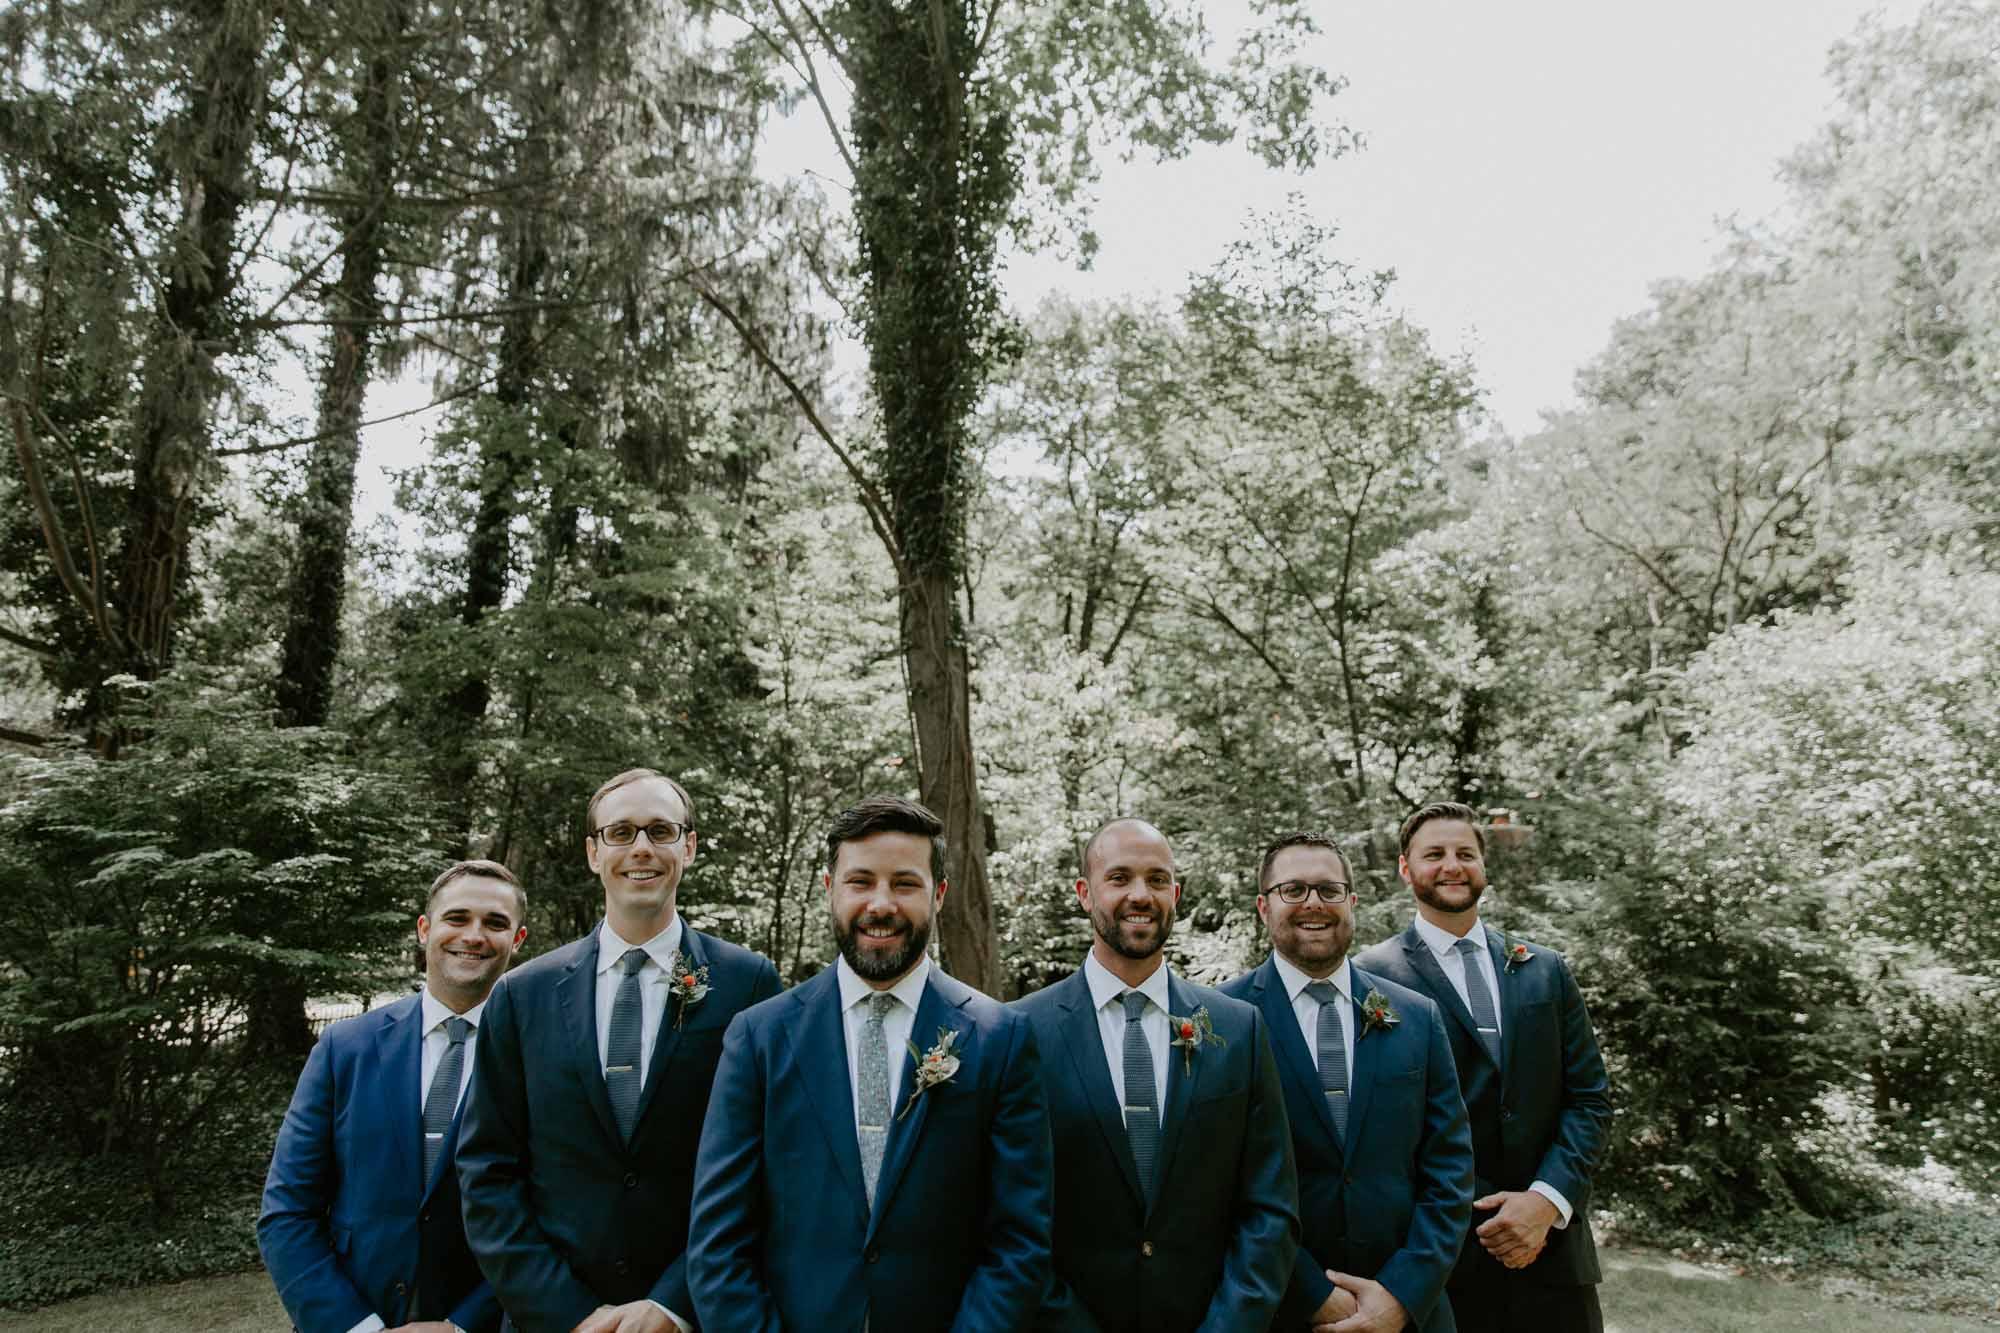 journeyman_distillery_wedding_photographer_chicago_il_wright_photographs-5957.jpg